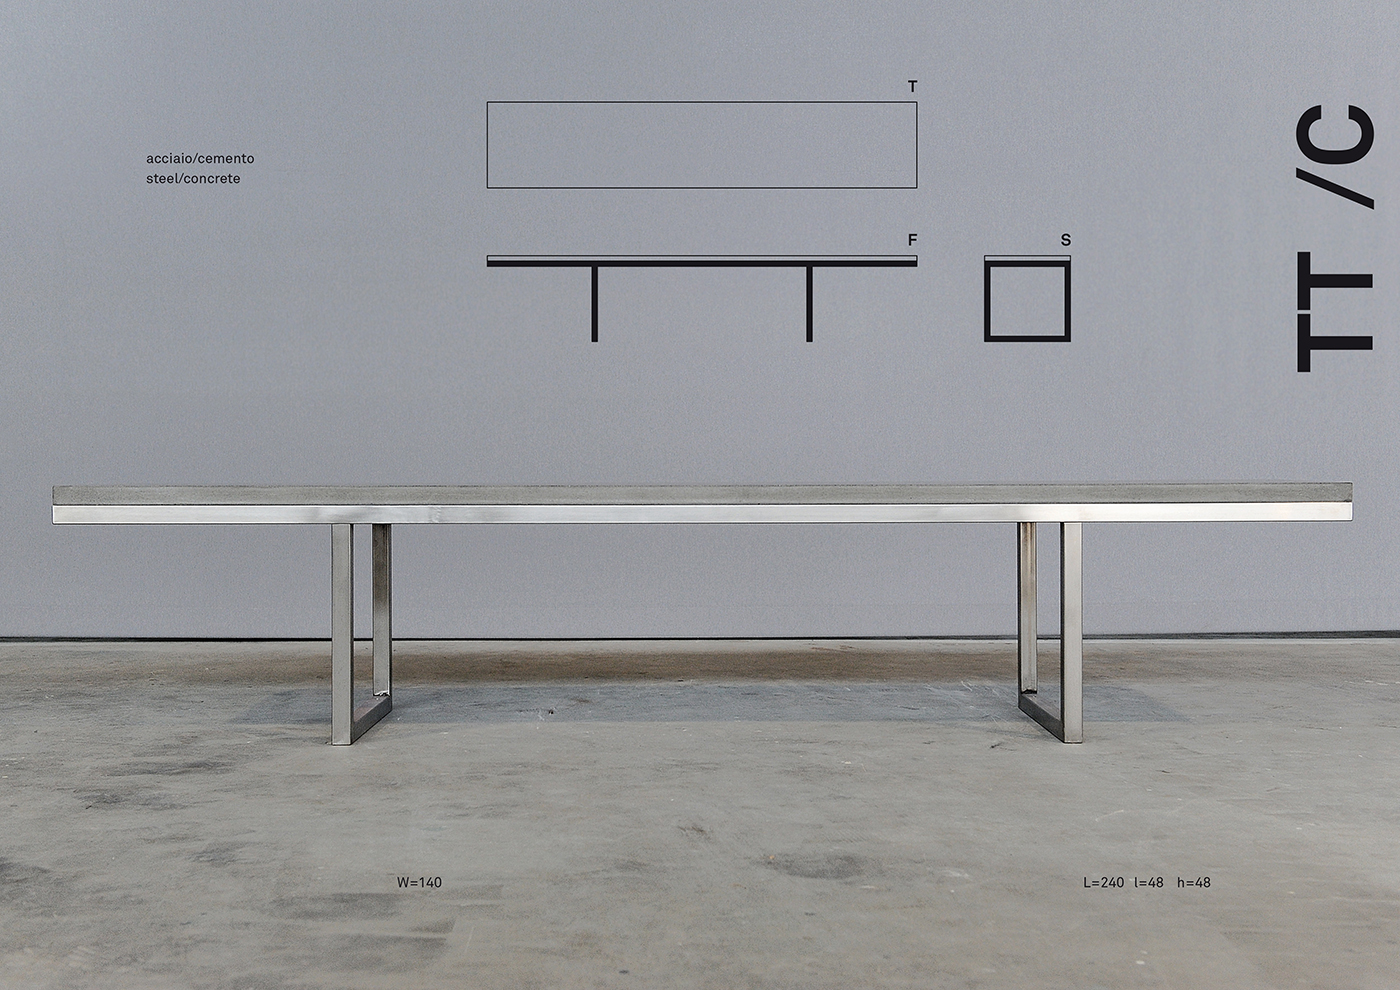 TT design di una panchina in cemento e acciaio disegnata da Francesco Aureli